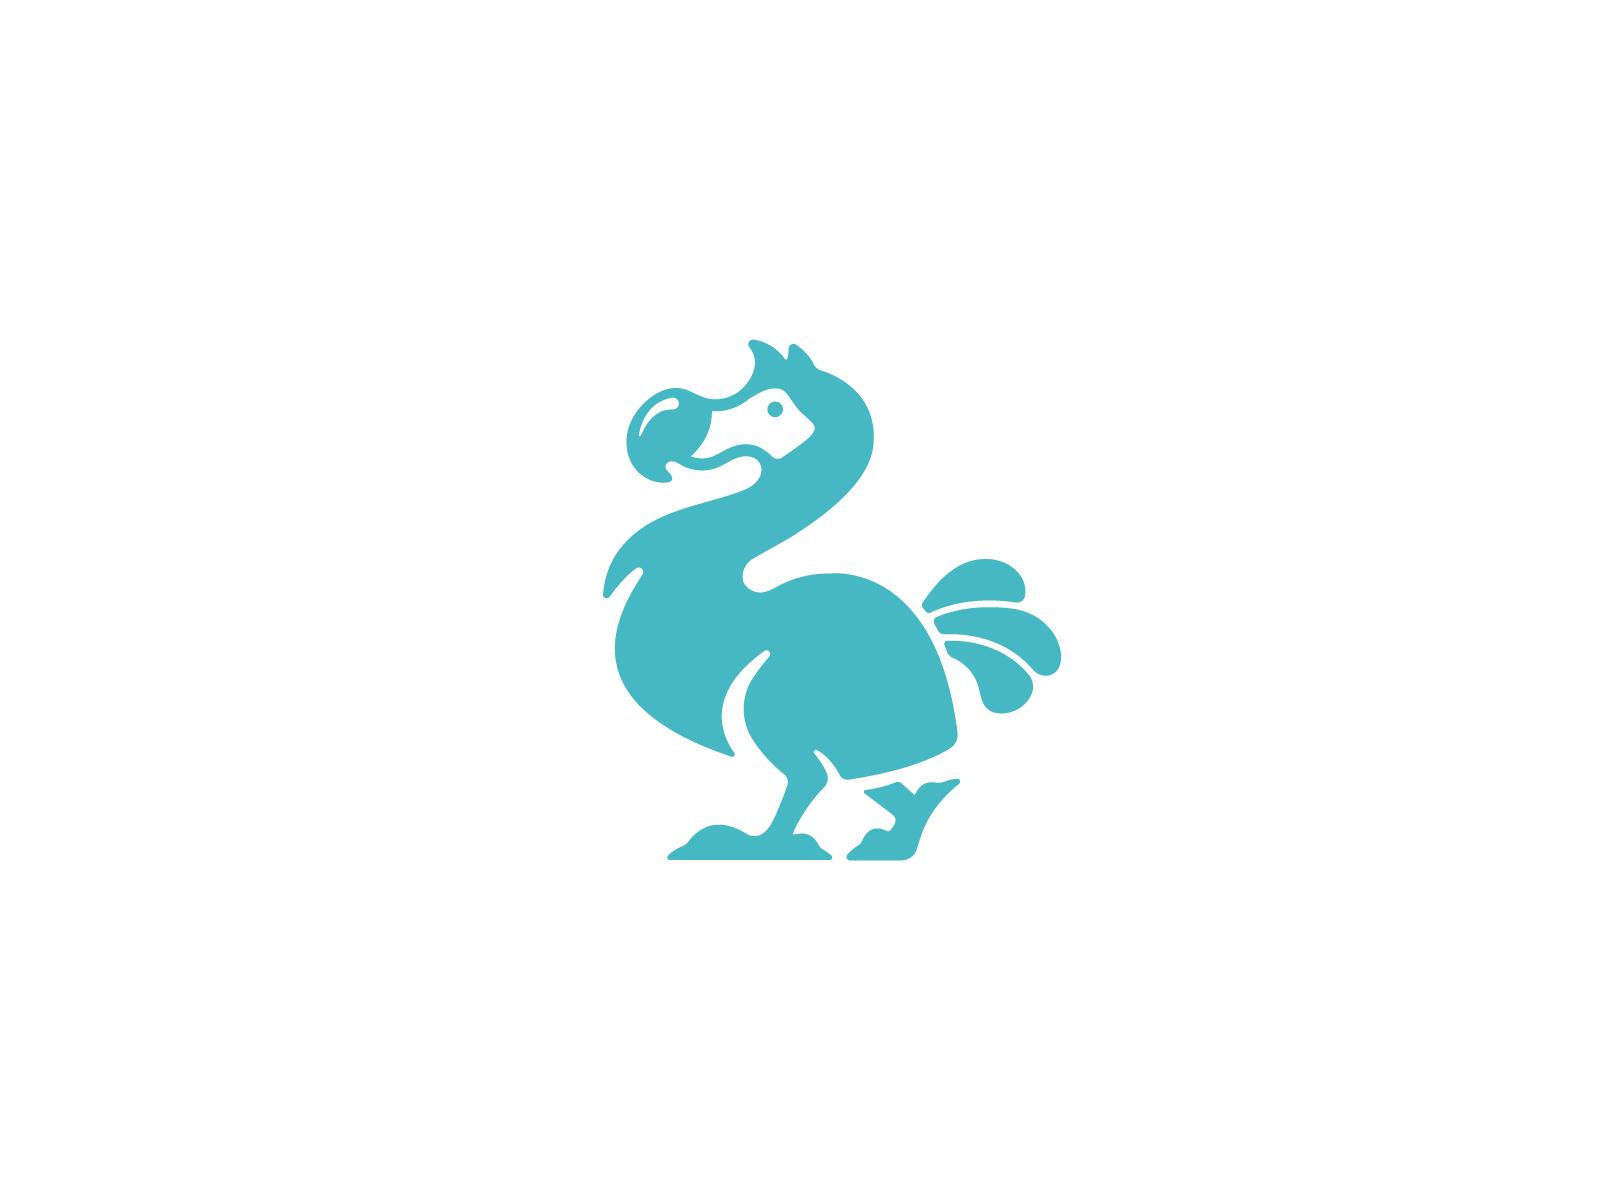 The Dodo Bird by Vlad Iftimescu on Dribbble.